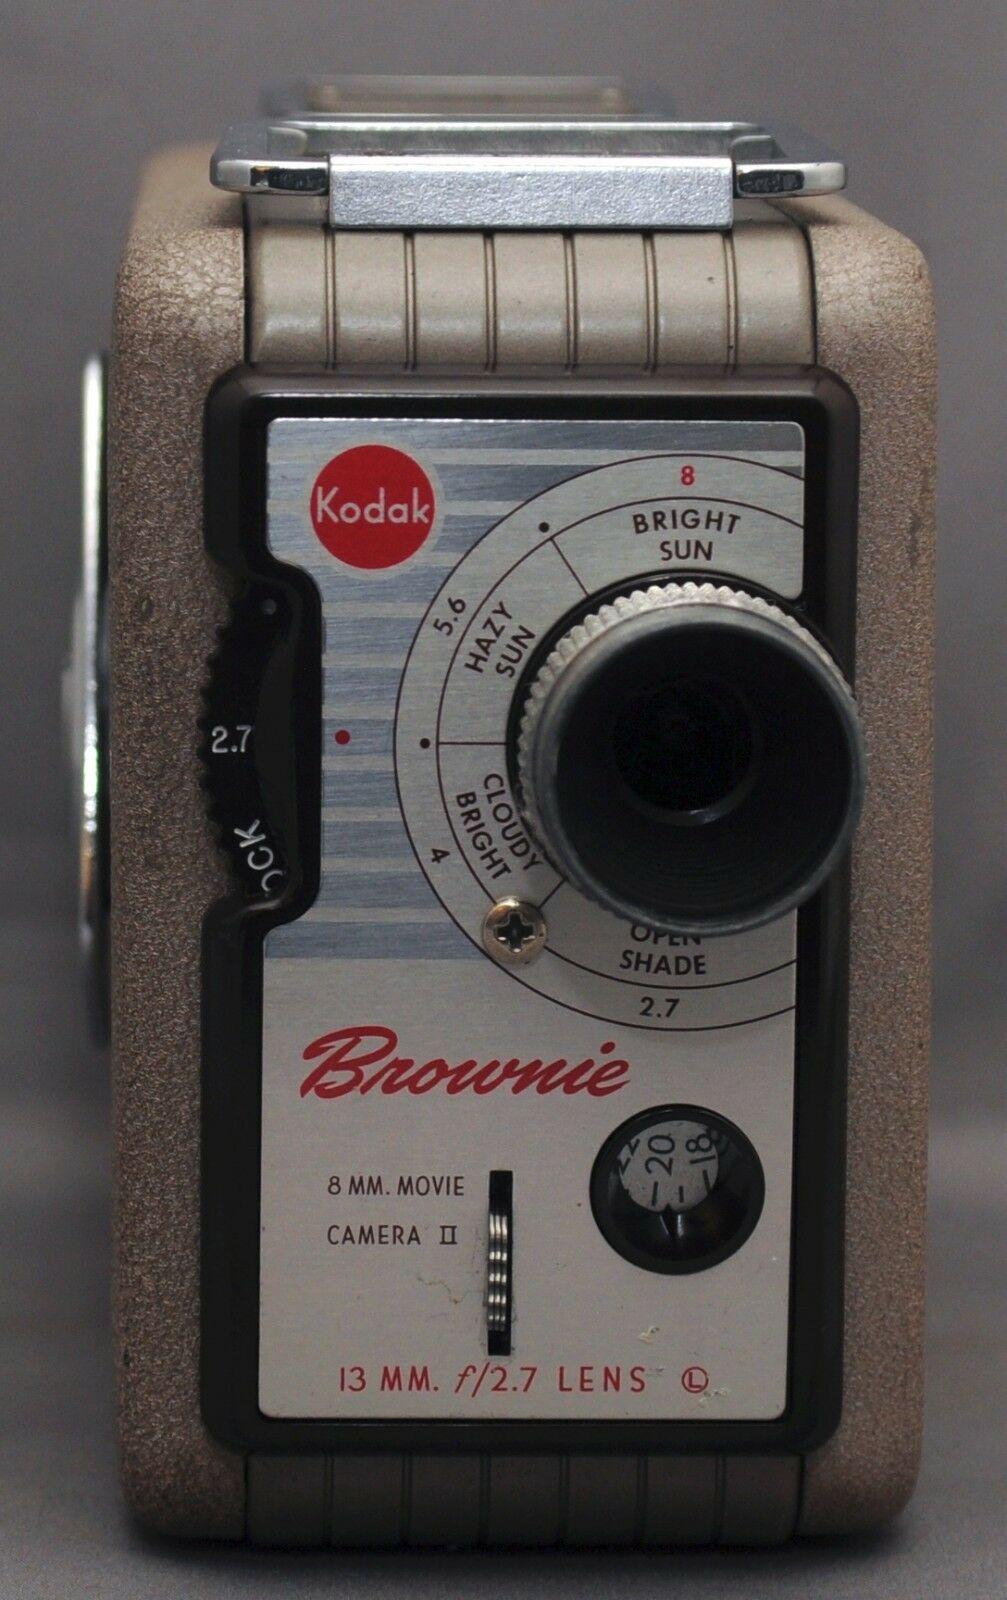 8Mm Vintage Camera kodak brownie 8mm vintage movie camera f/2.7 and 50 similar